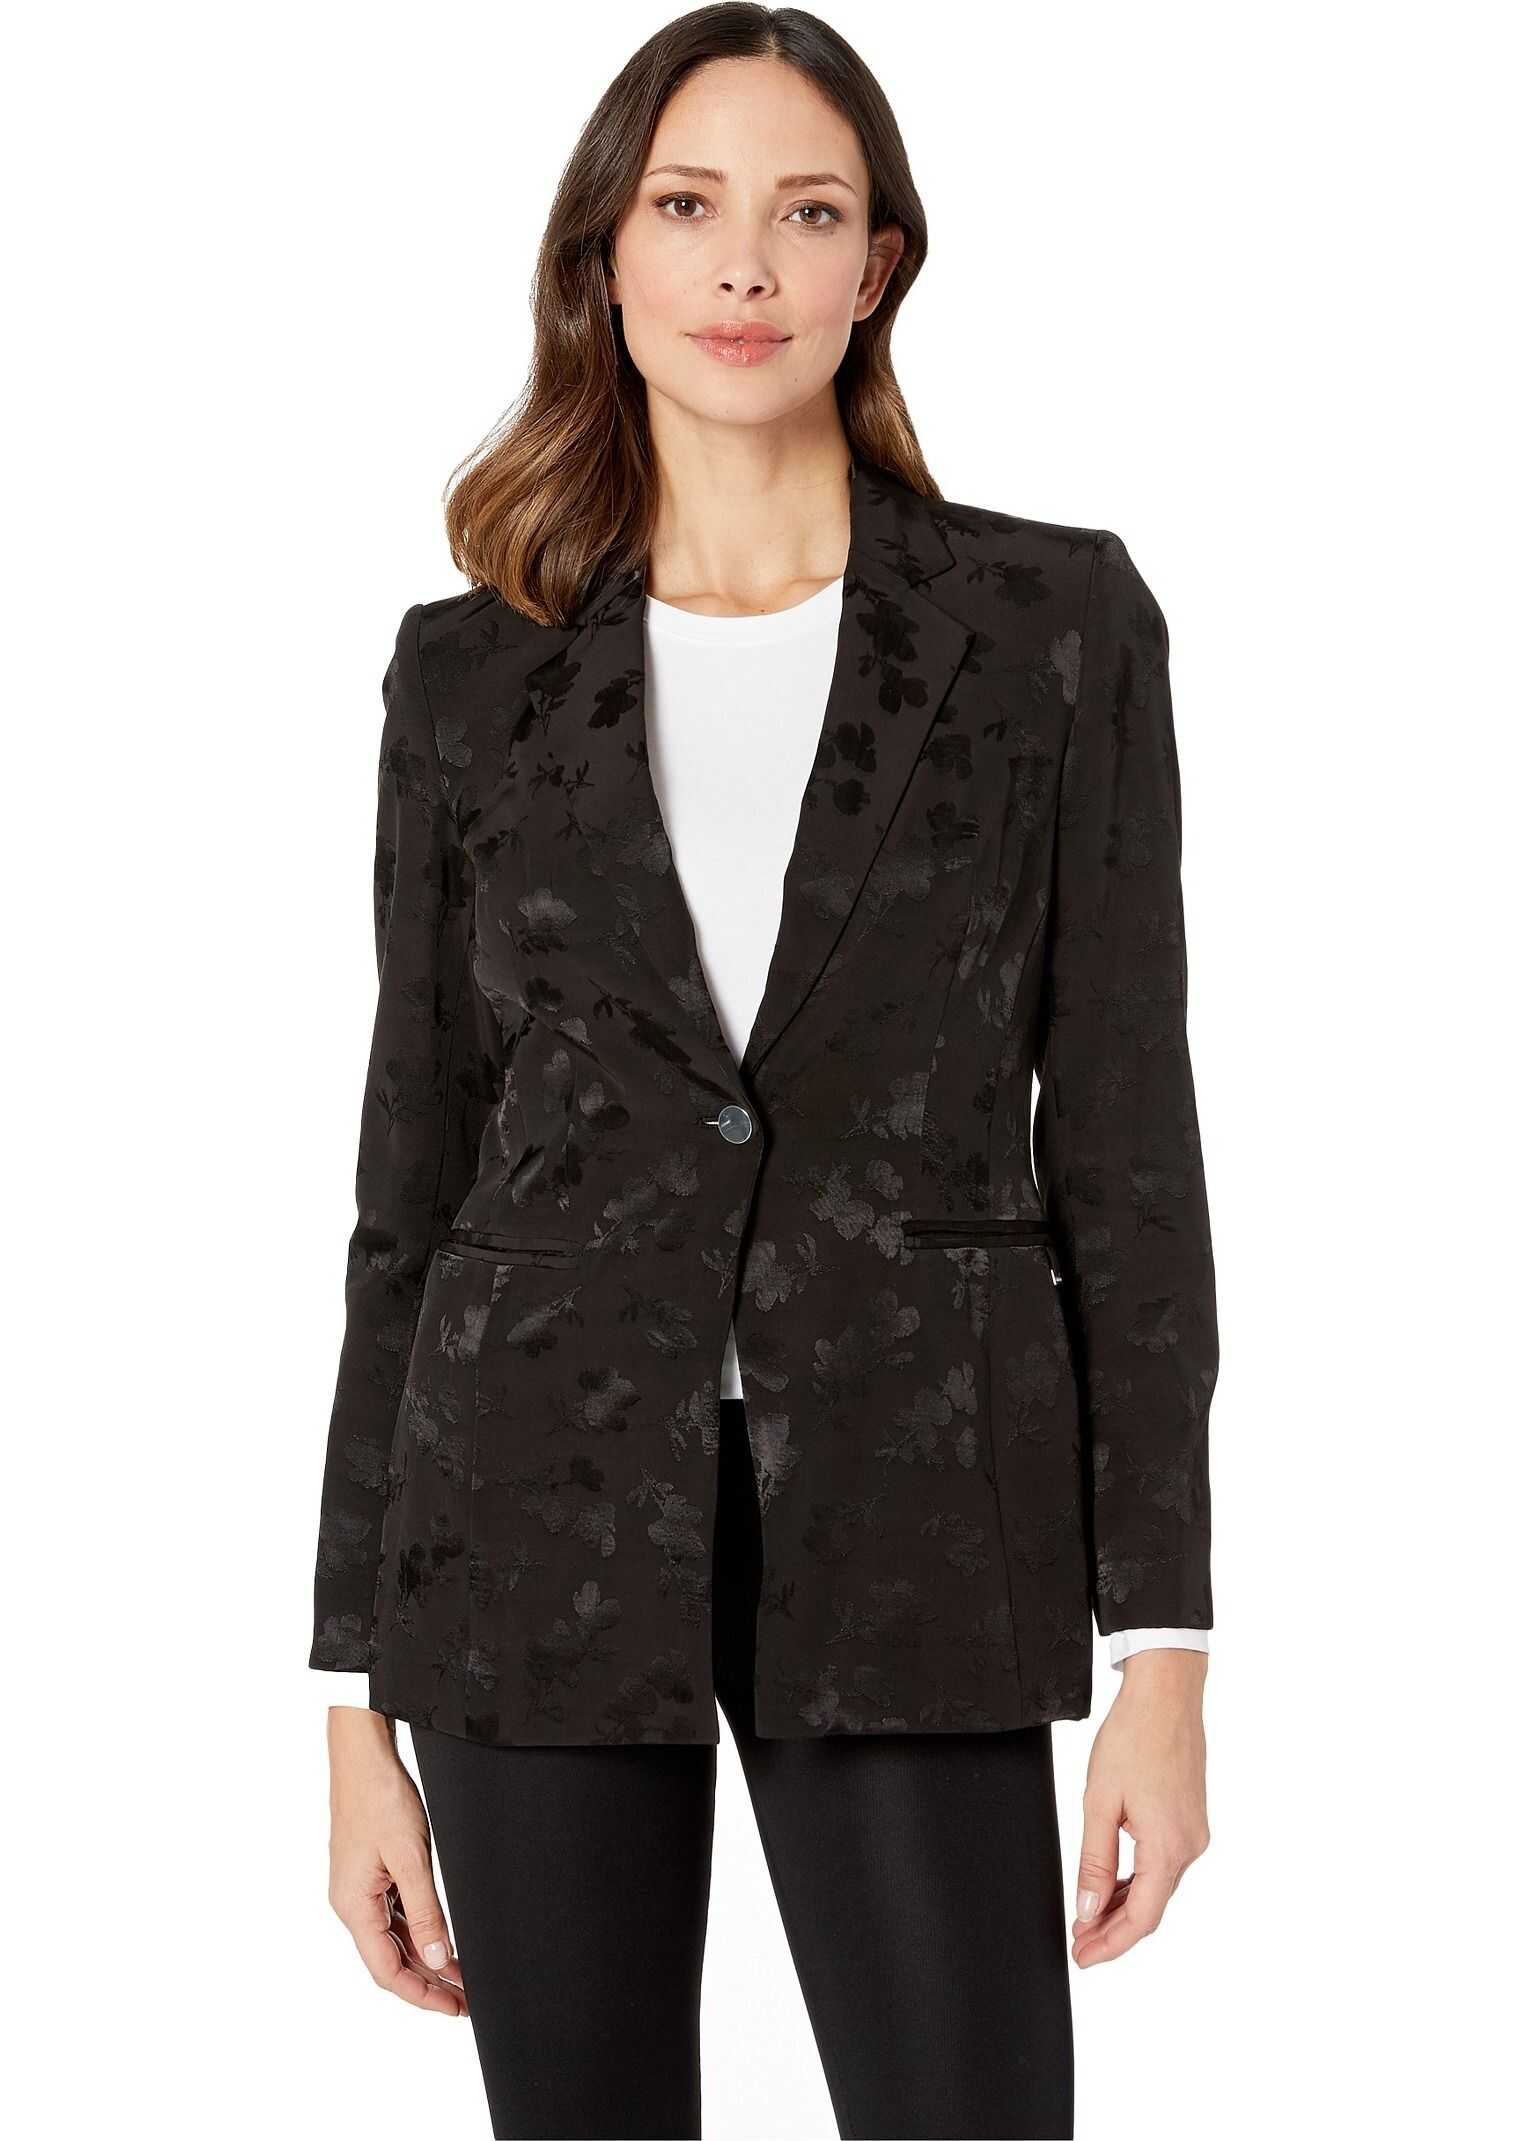 Calvin Klein Soft Suiting Jacket Black/Black